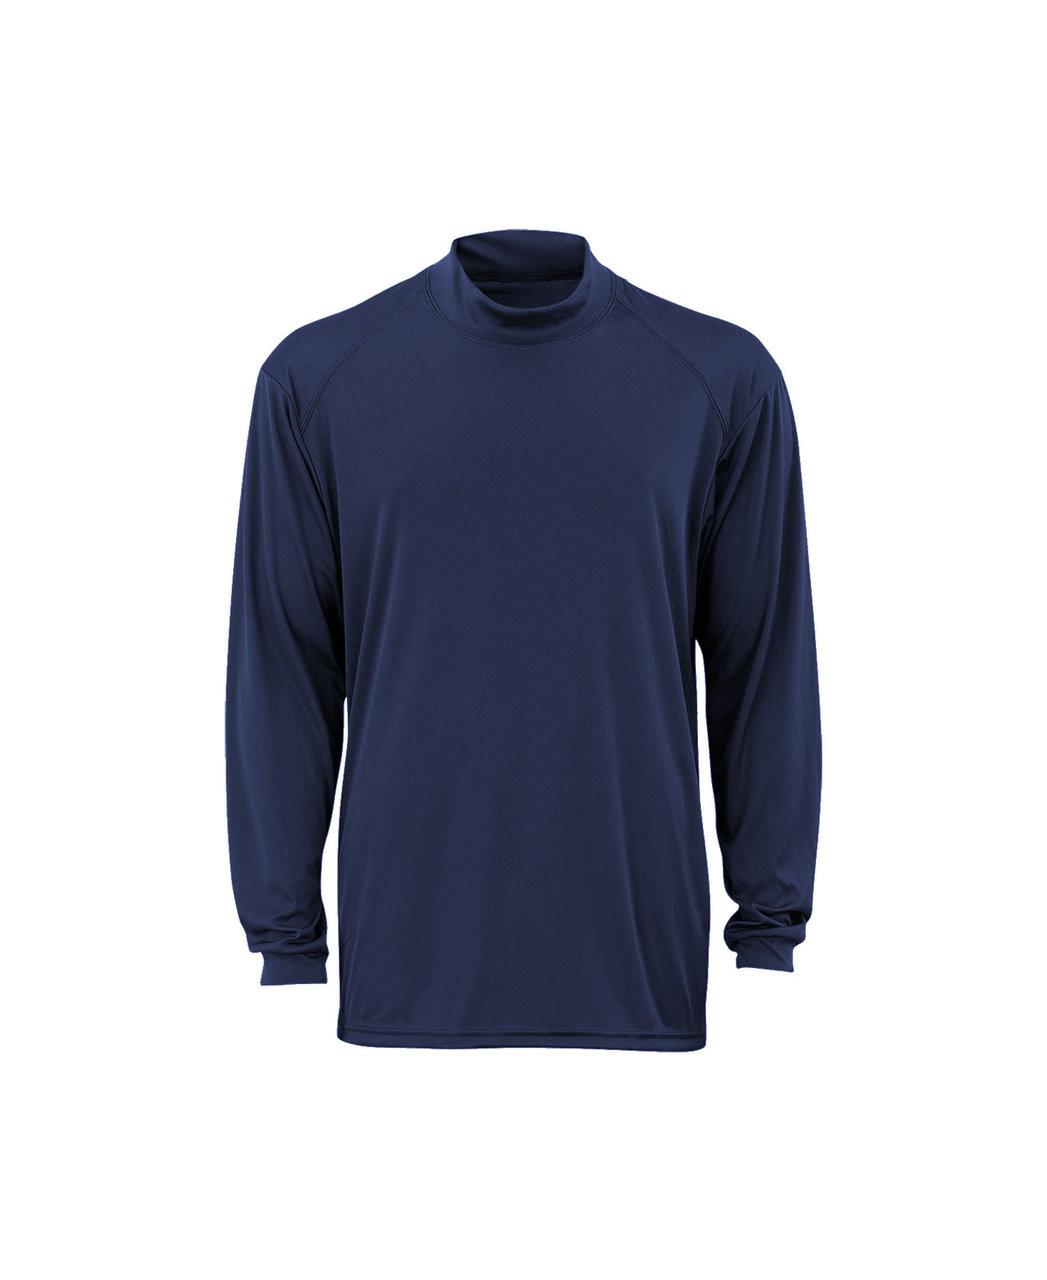 Badger B-Core Mock Shirt Navy